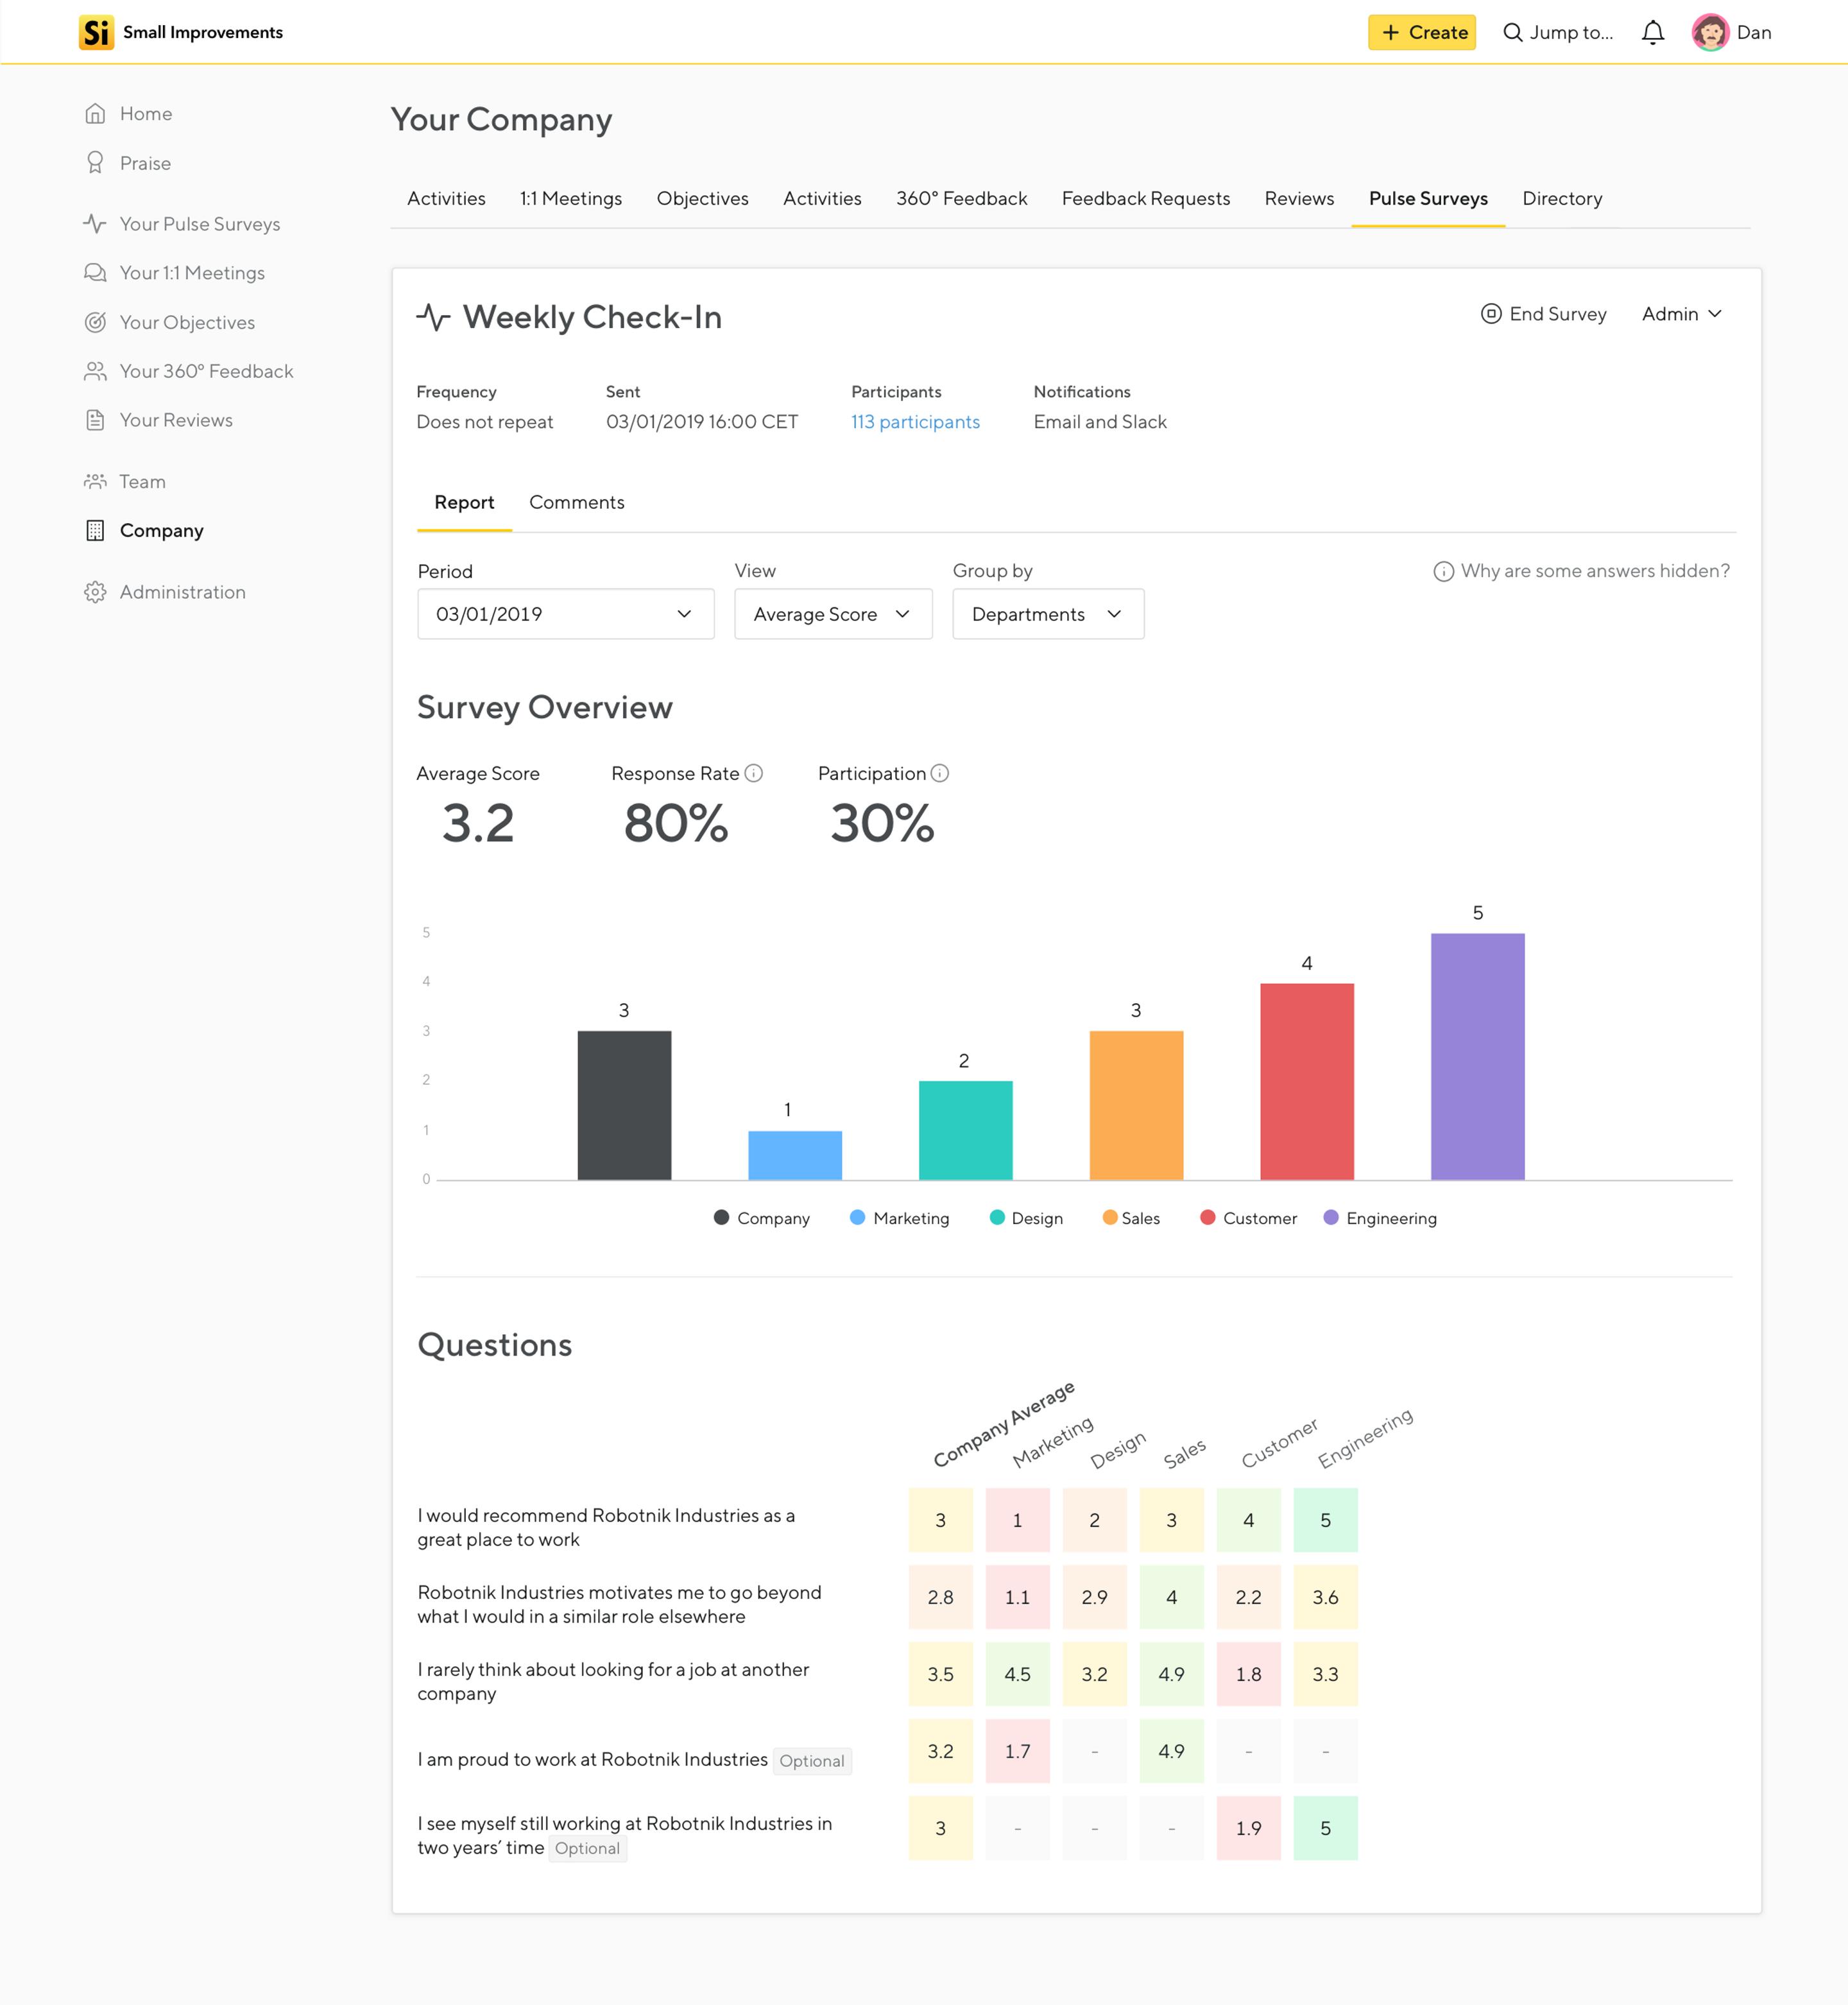 Survey Dashboard Screenshot showing the data for a single survey